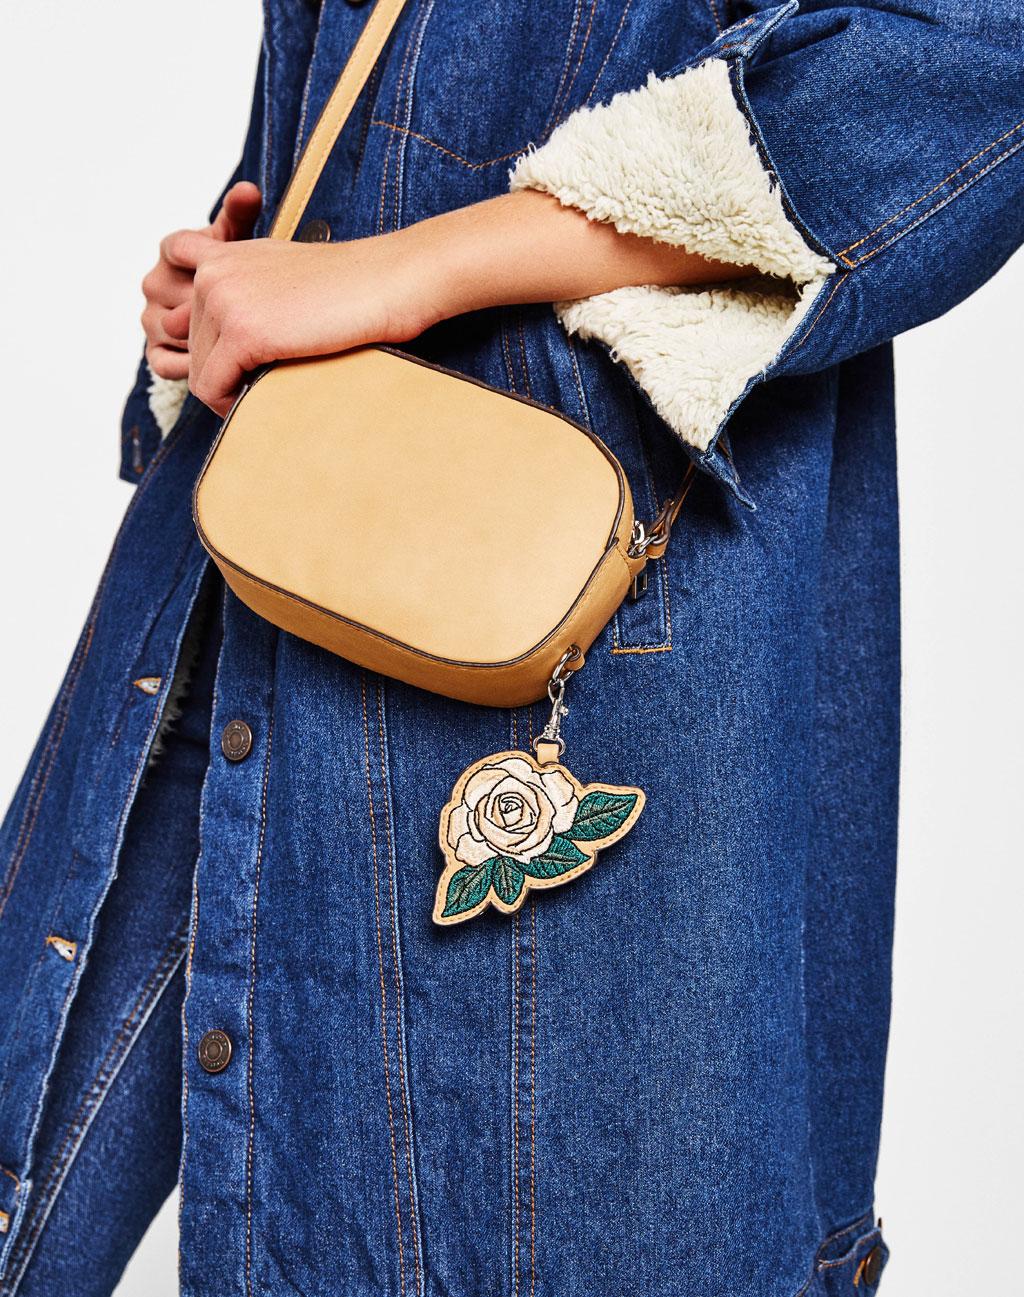 Handbag with a flower keyring